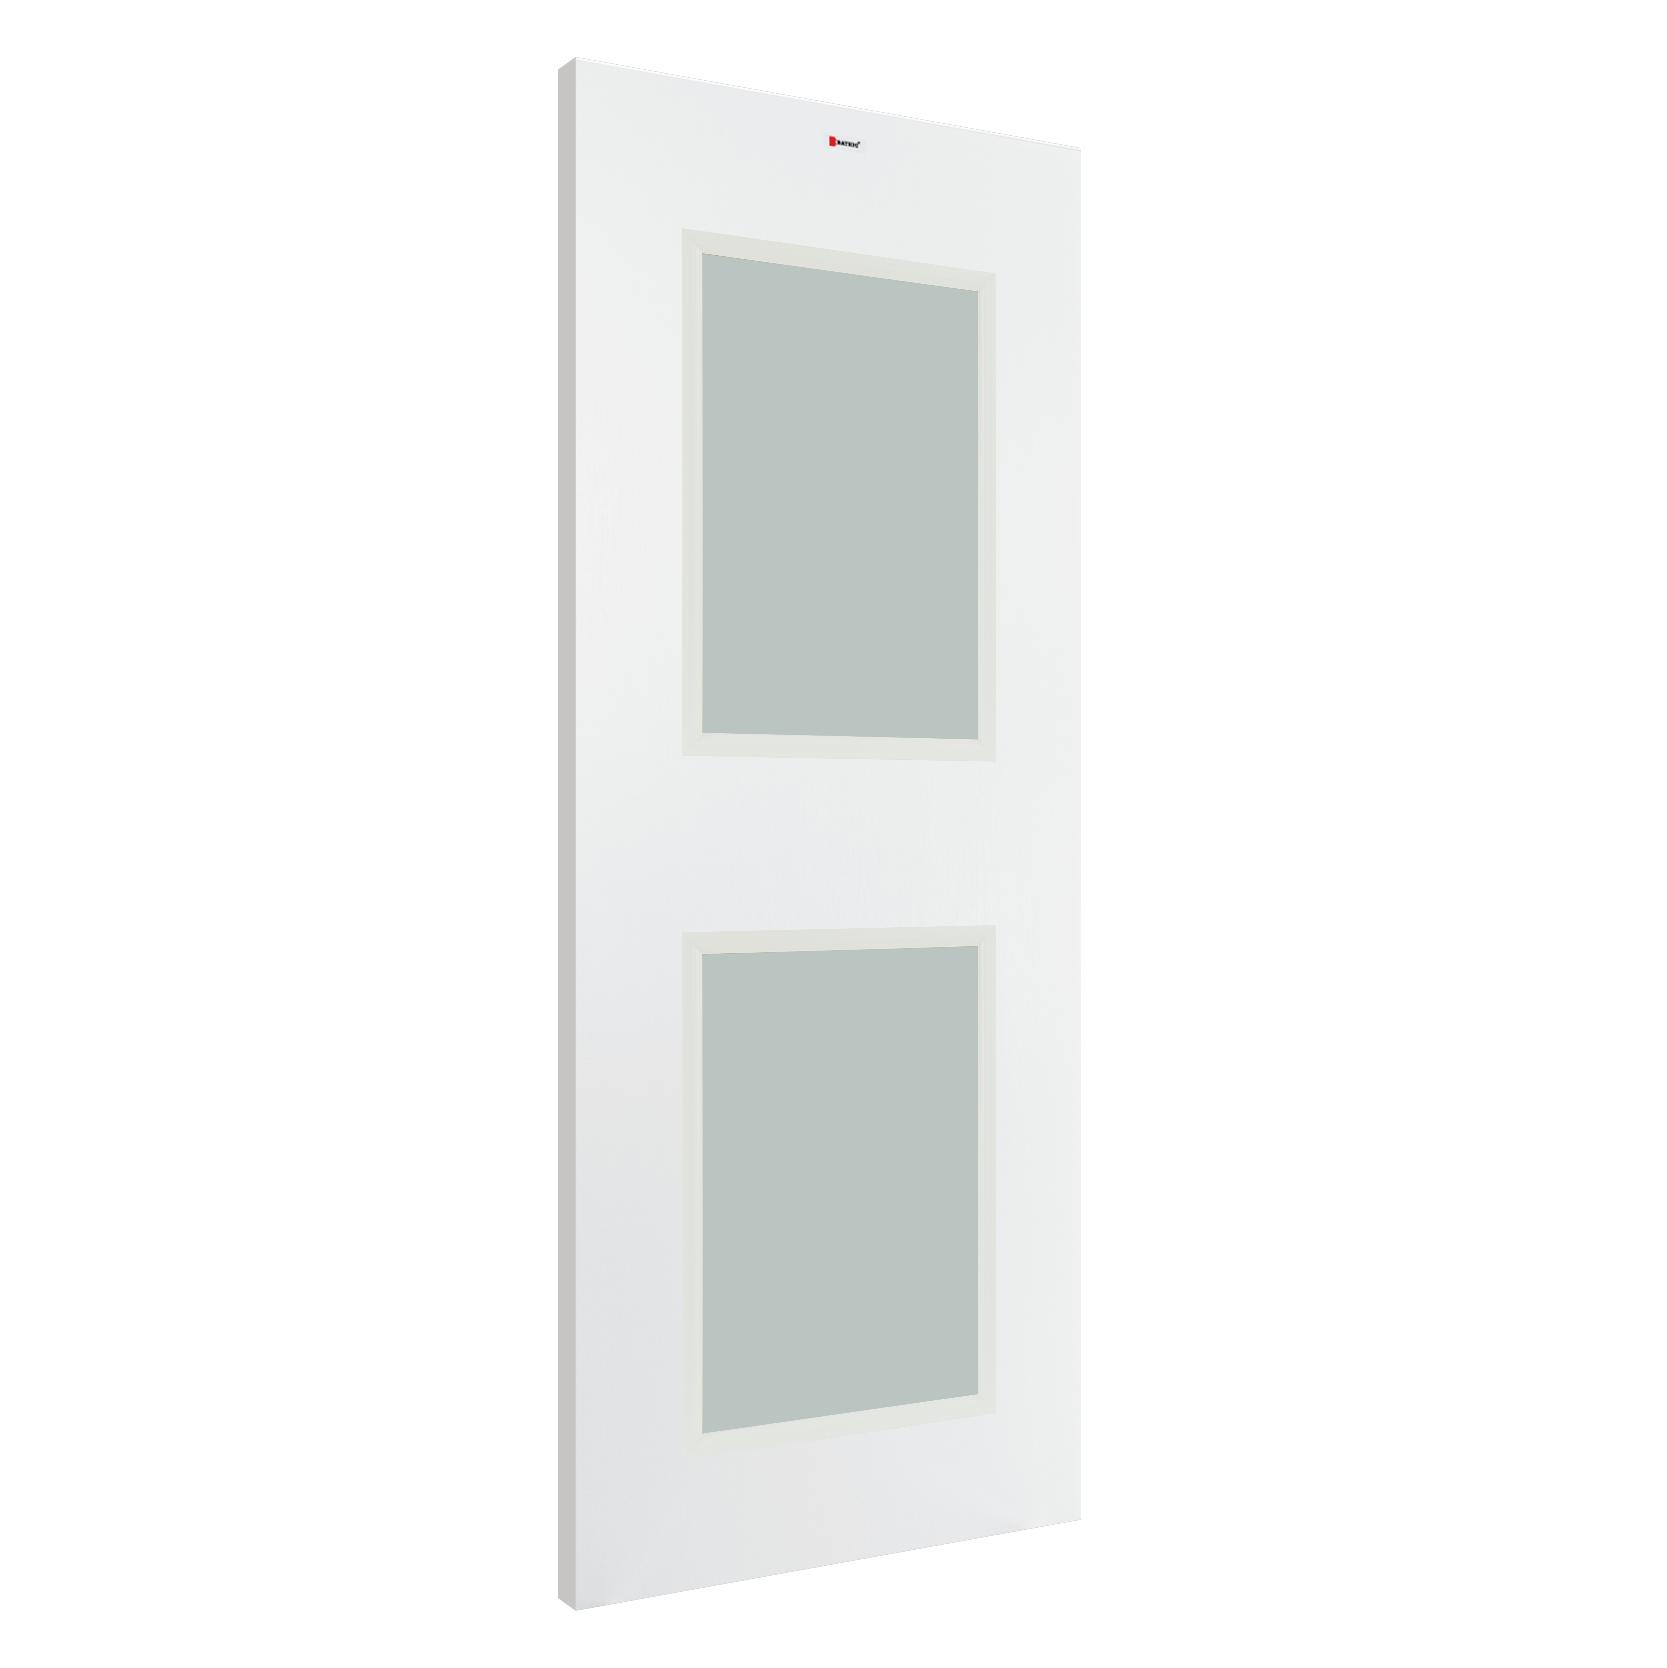 door-wpc-bathic-bwg04-grainwhite-3